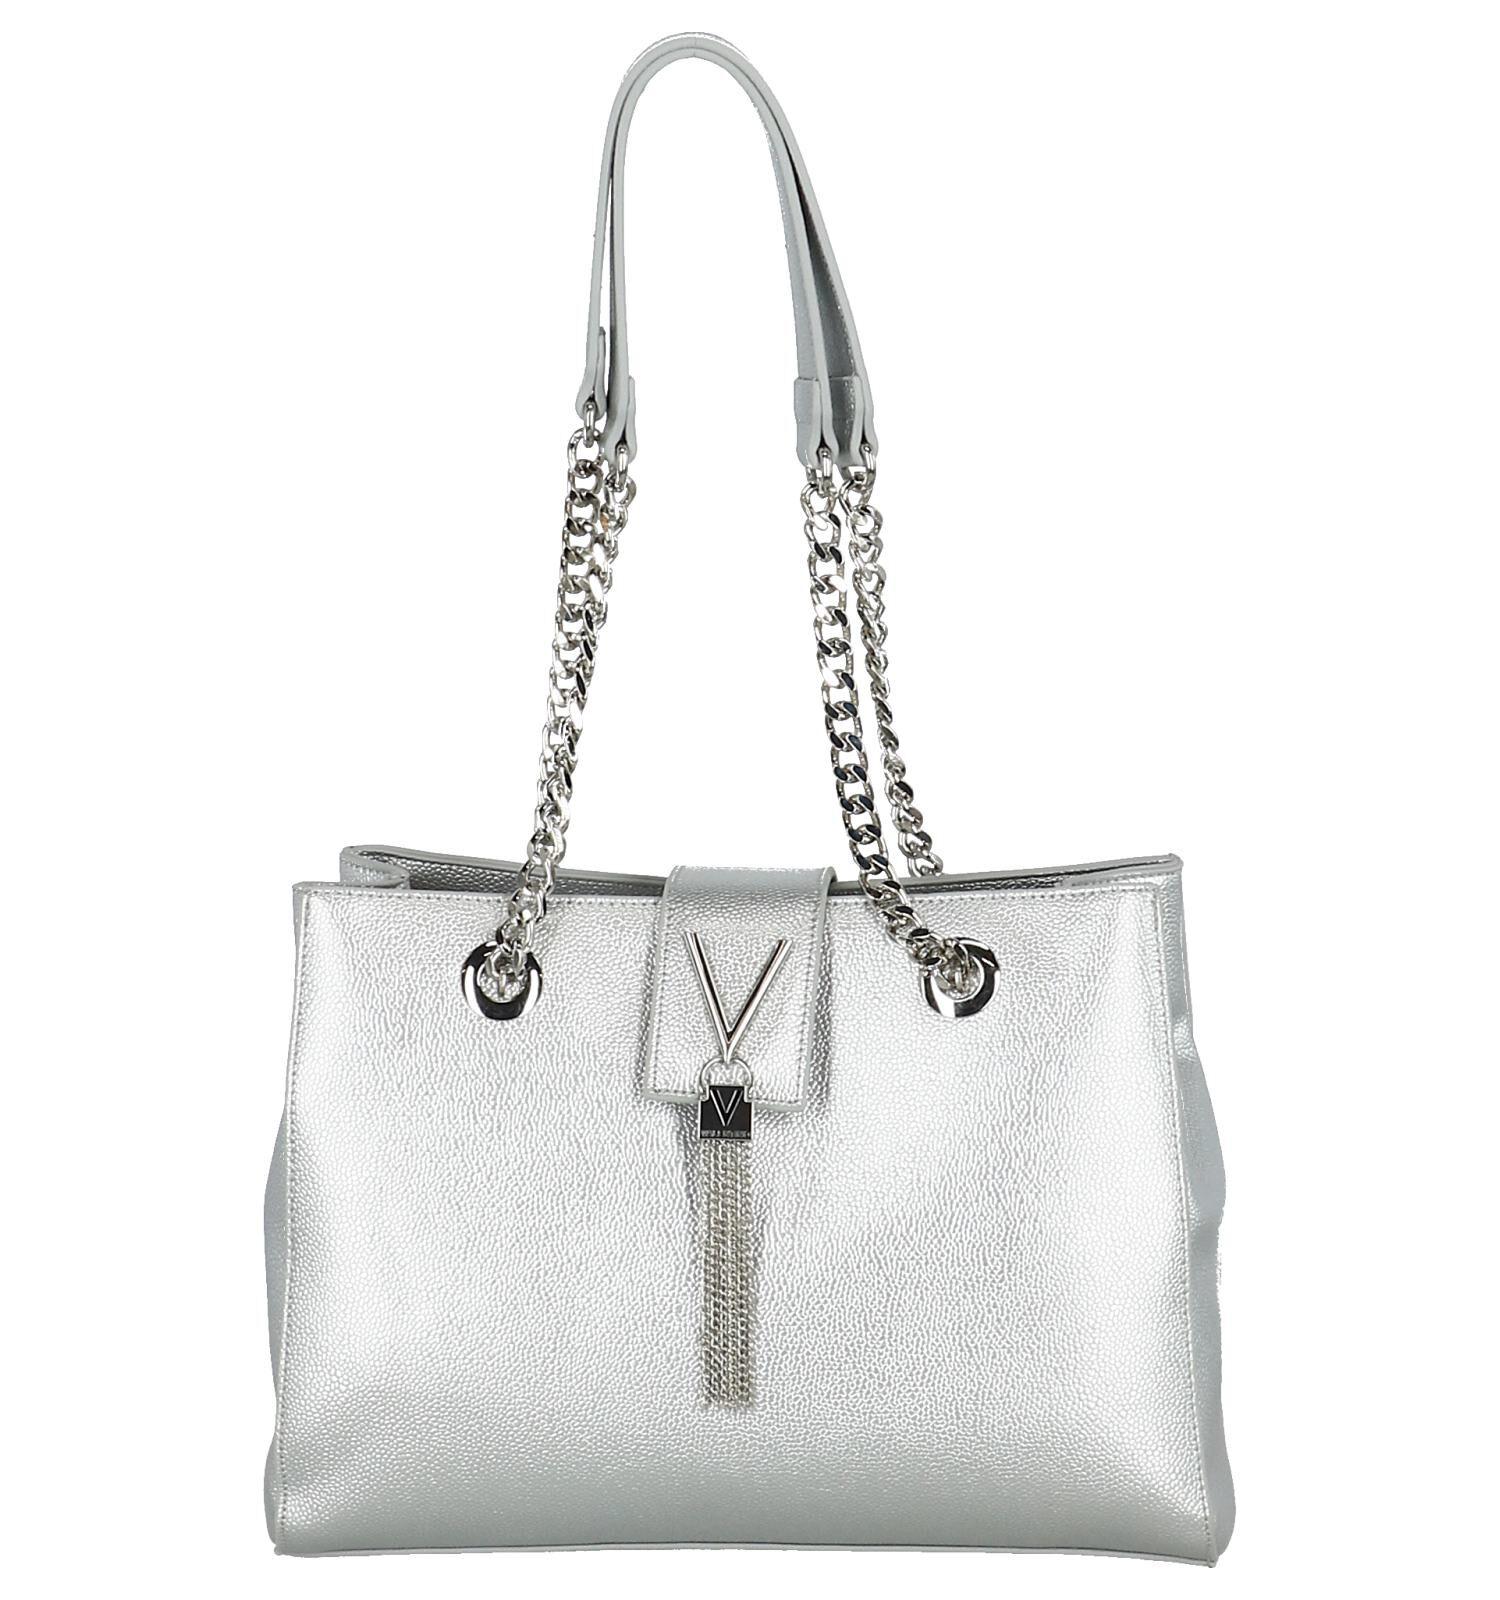 Aanbieding Schoudertas Valentino Lichtbeige Clove Handbags TYYxwqBa1S